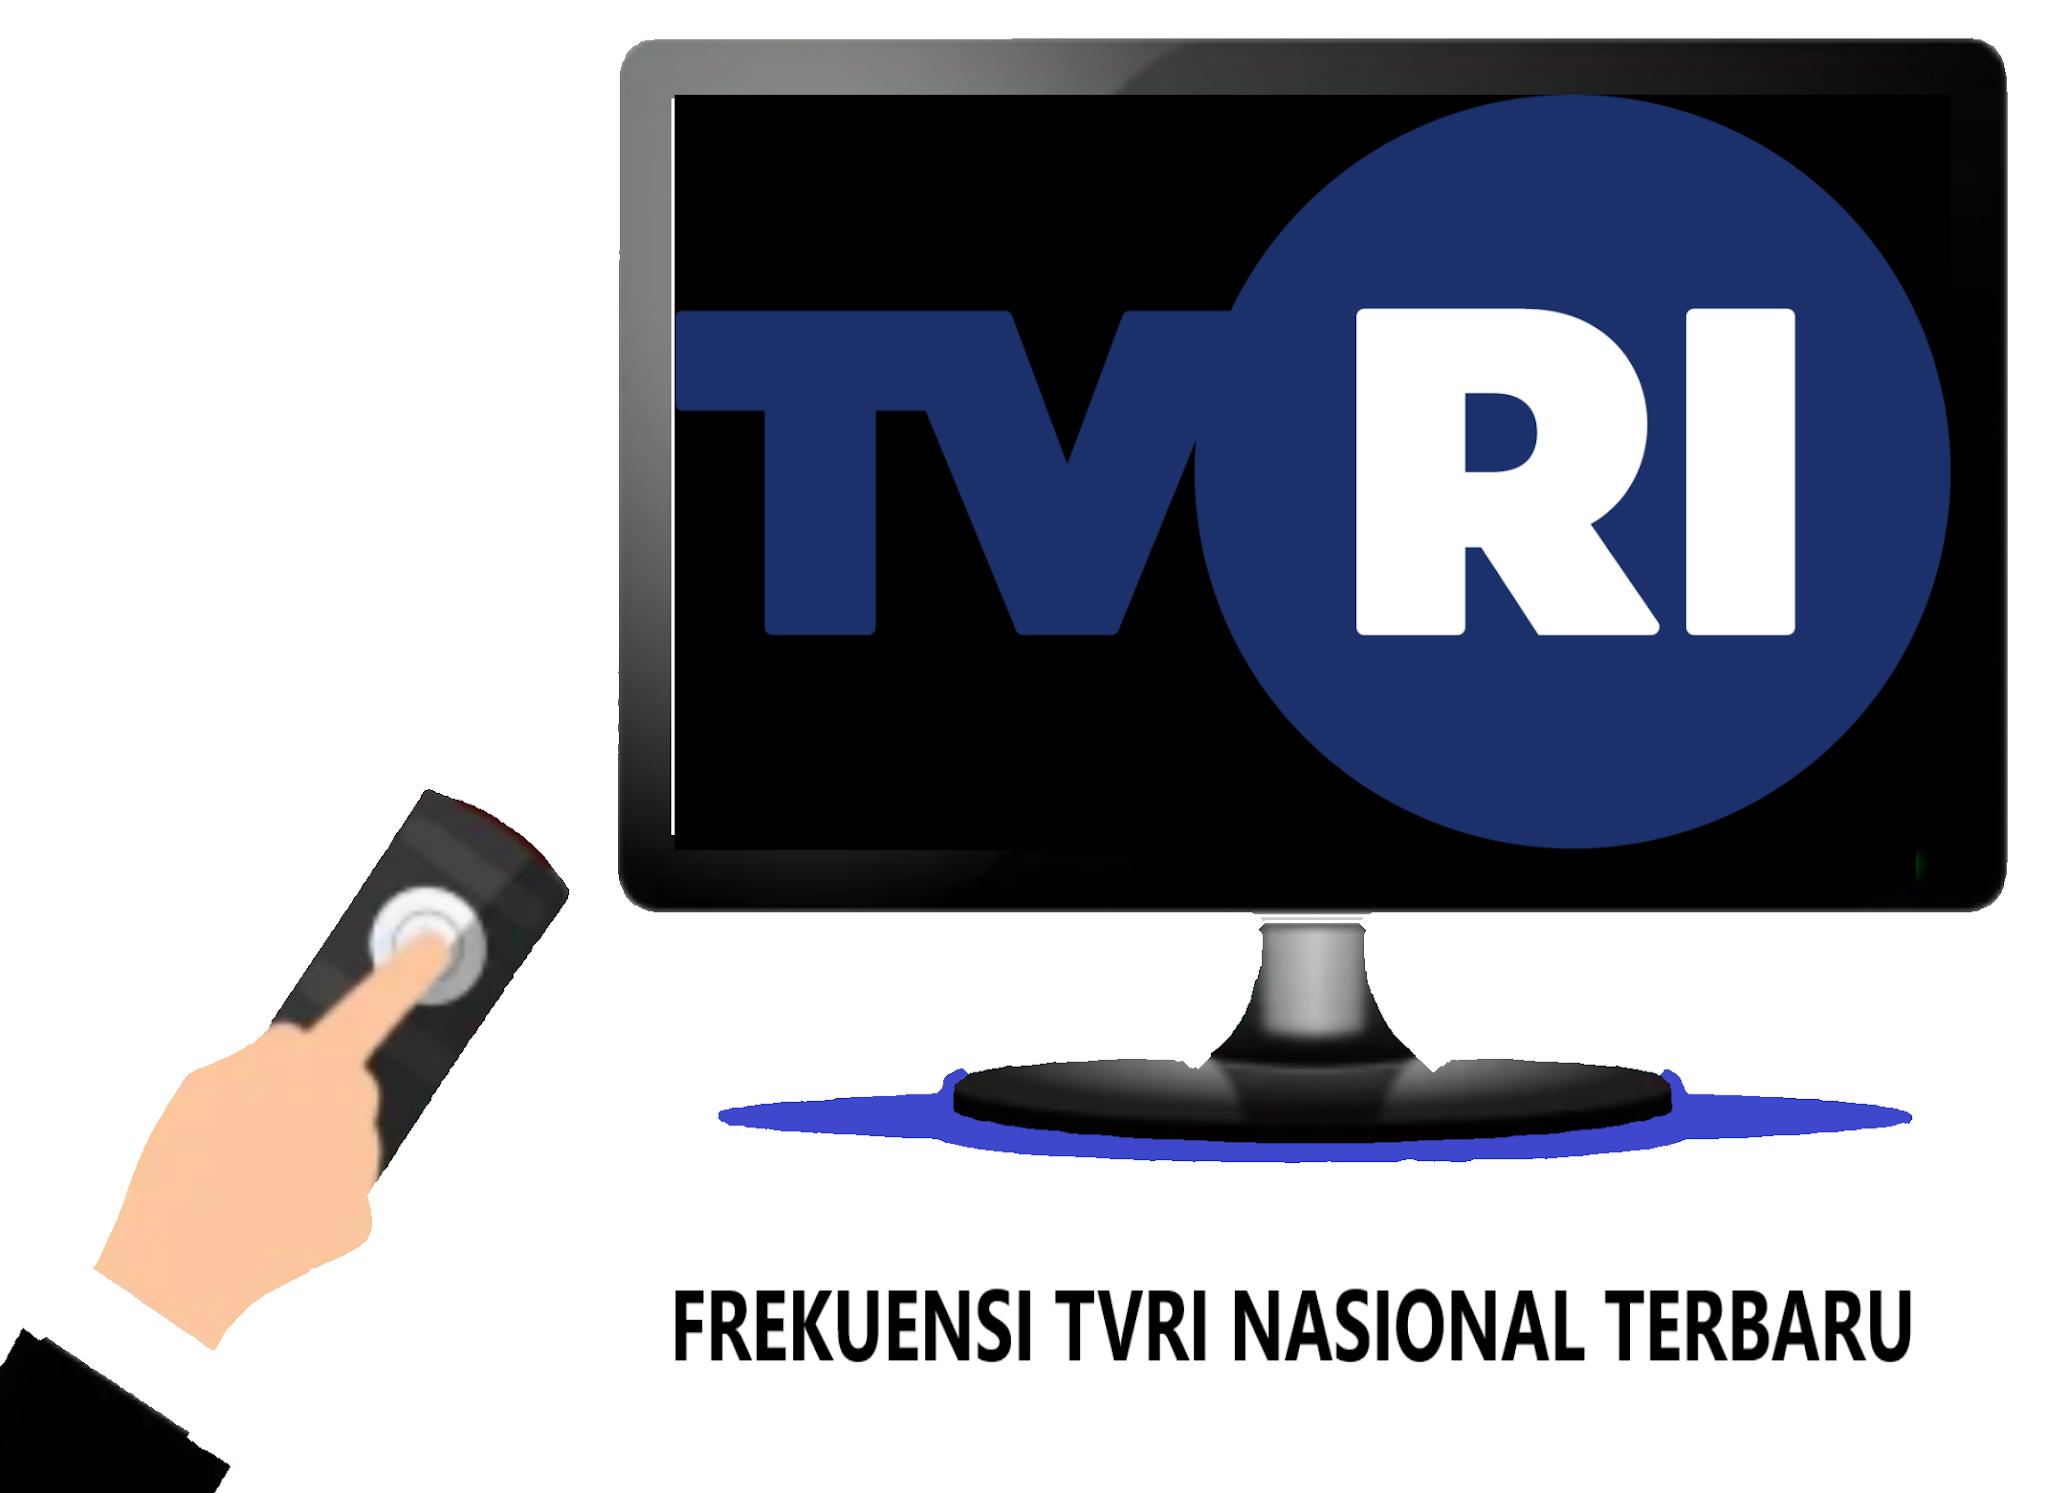 Frekuensi TVRI Nasional Terbaru Di Telkom 4 Update 2020